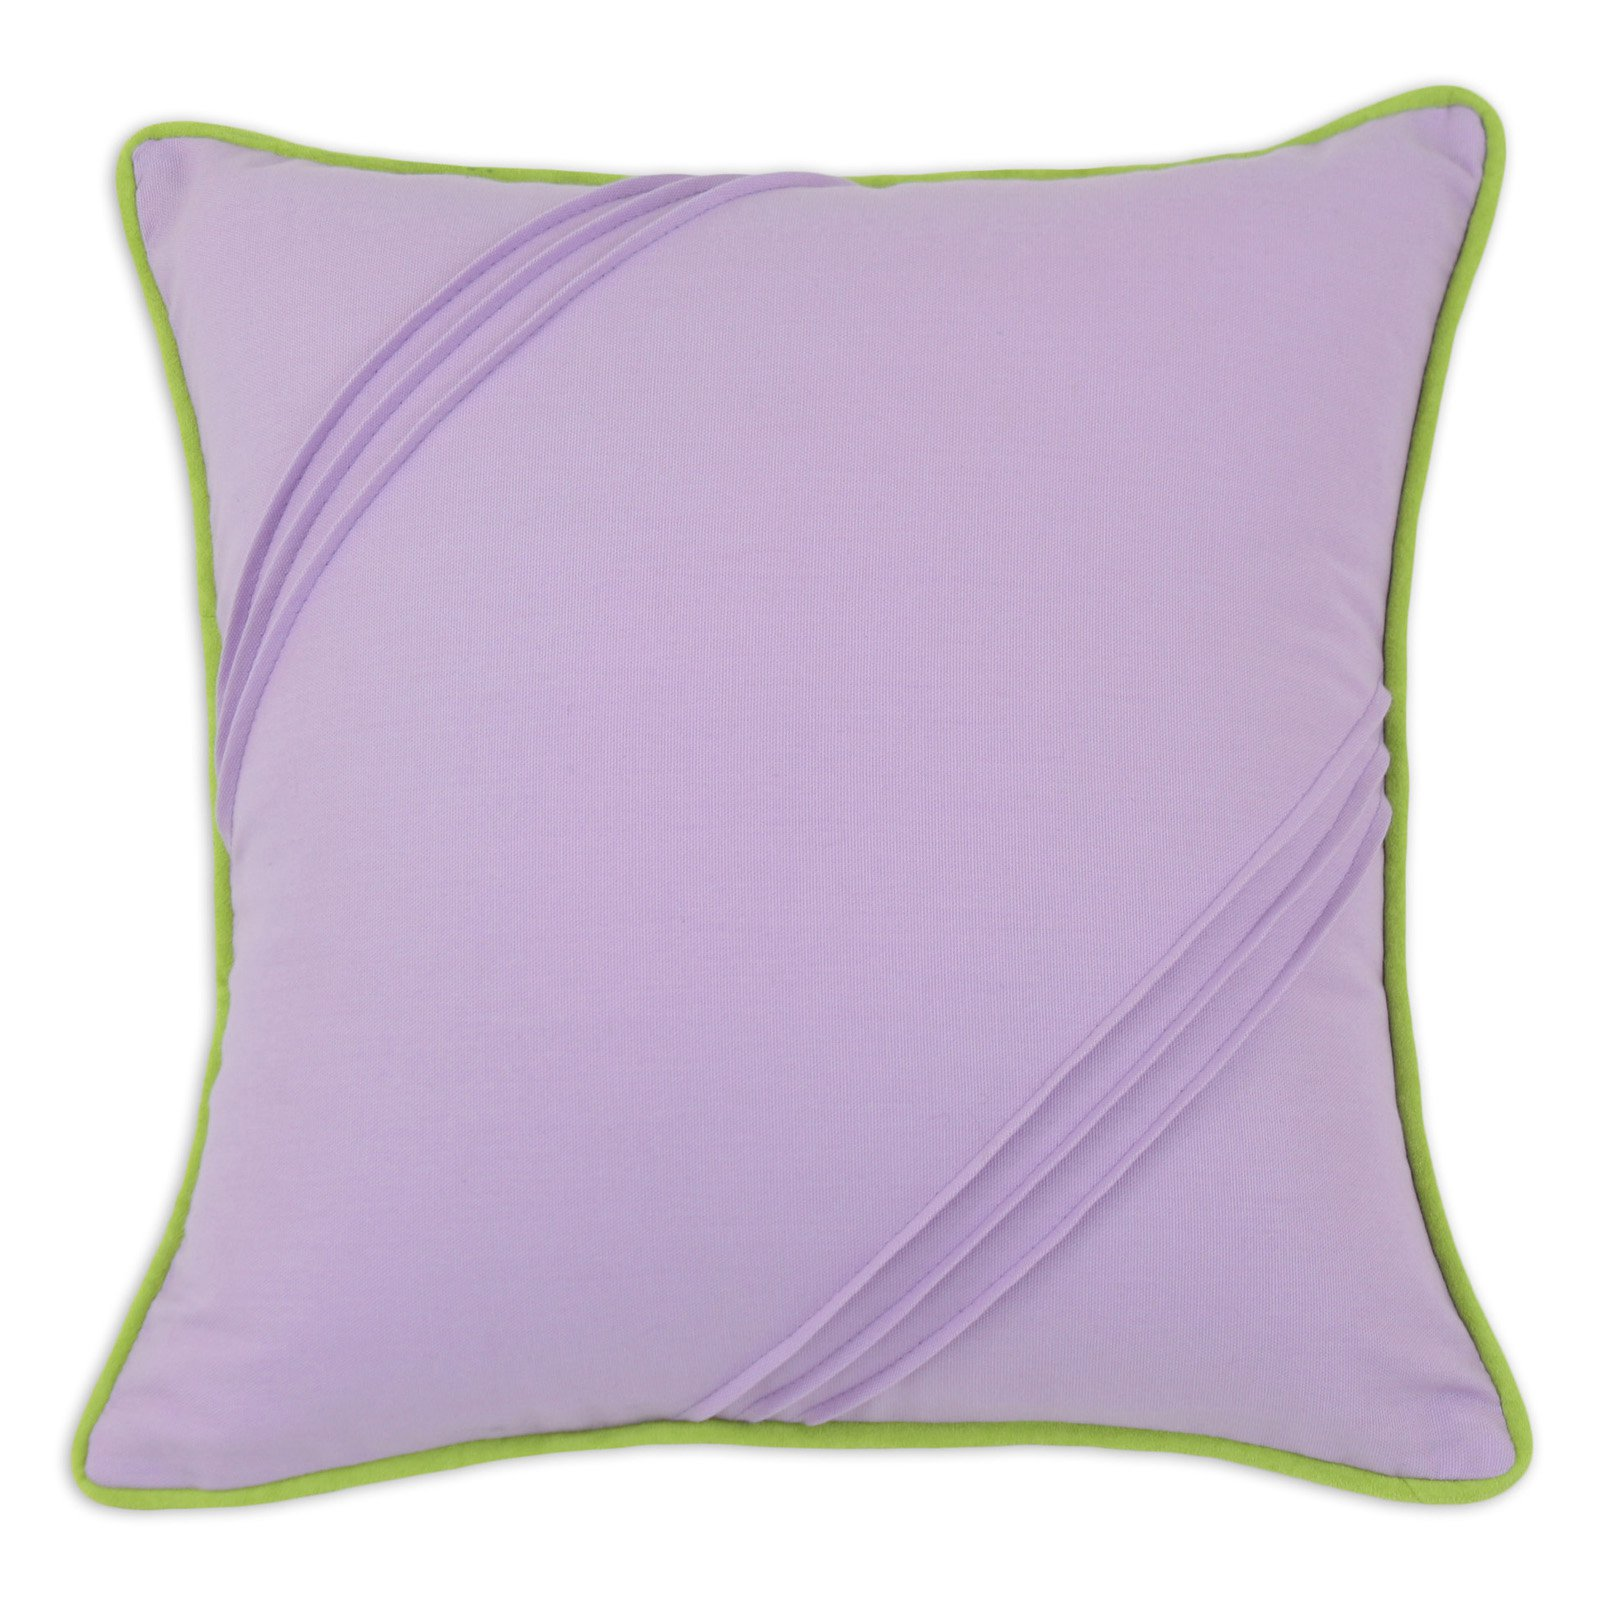 Brite Ideas Living Duck Parasol 6 Corner Seamed Self Corded D-Fiber Pillow